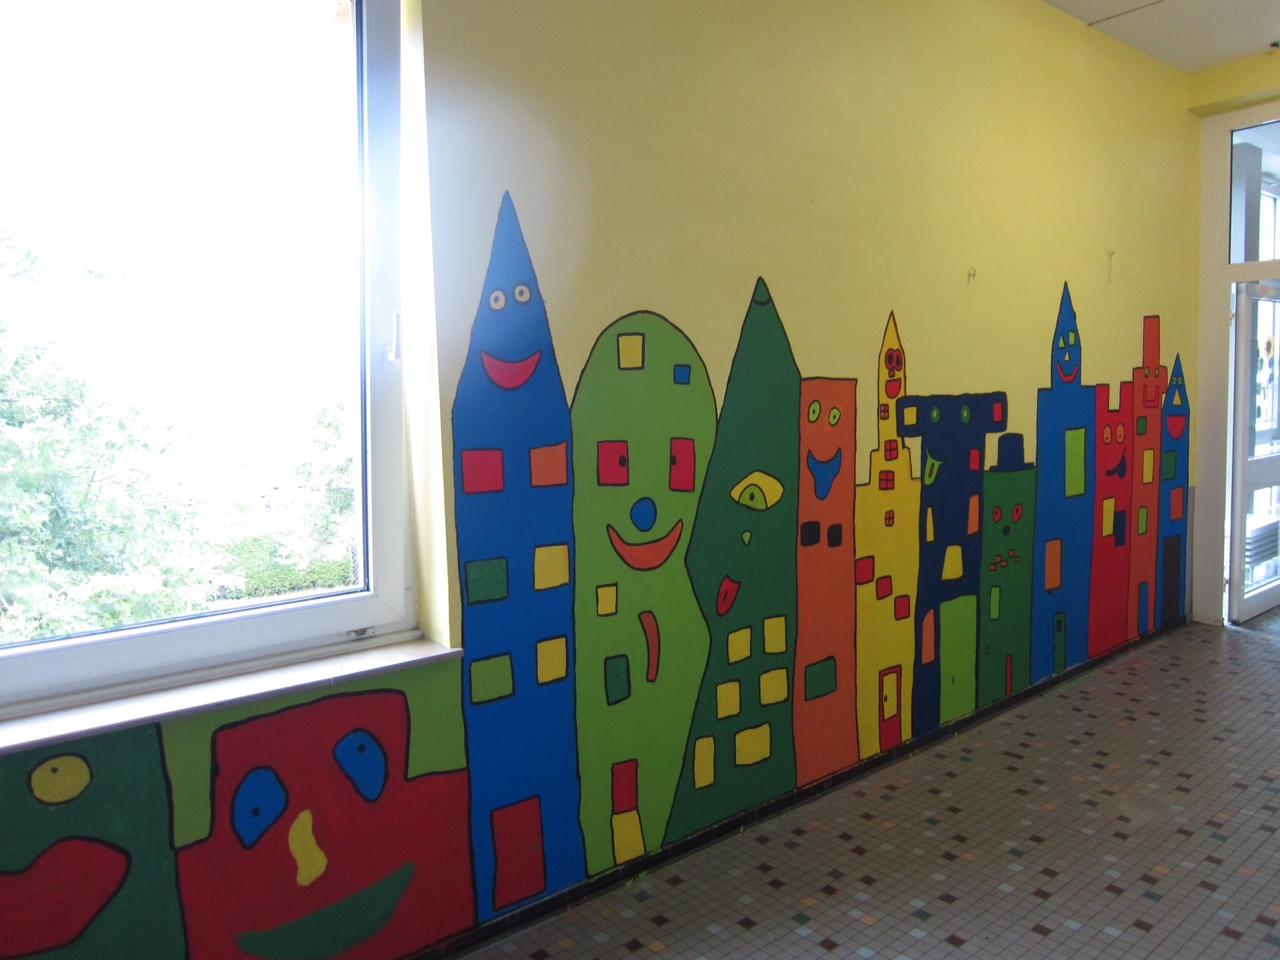 Wandgestaltung christophorus schule in betzdorf bruche for Design schule